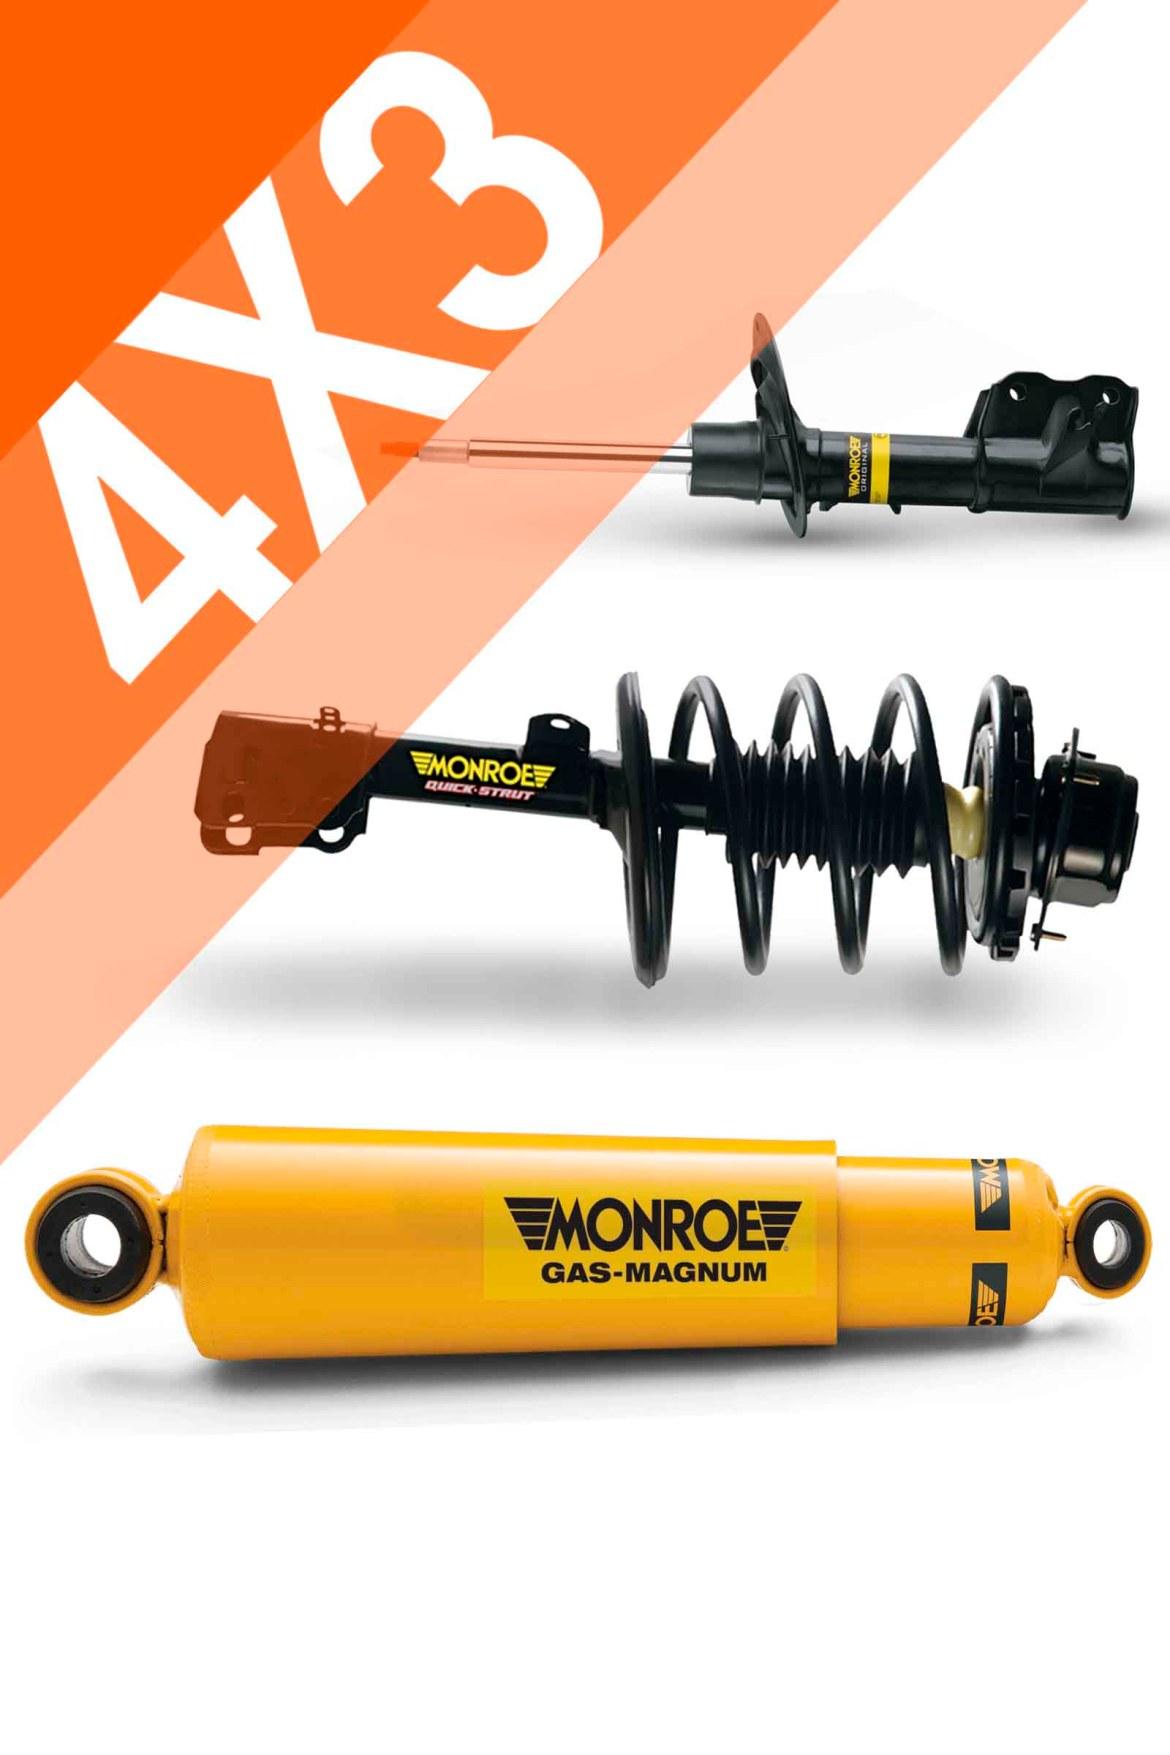 ServyCar-Taller-mecanico-automovil-multimarca-zaragoza-centro-Slider-Amortiguadores-Monroe-4x3-v2-Servycar- EstamosEnElCentro-201810xx_1950x1200